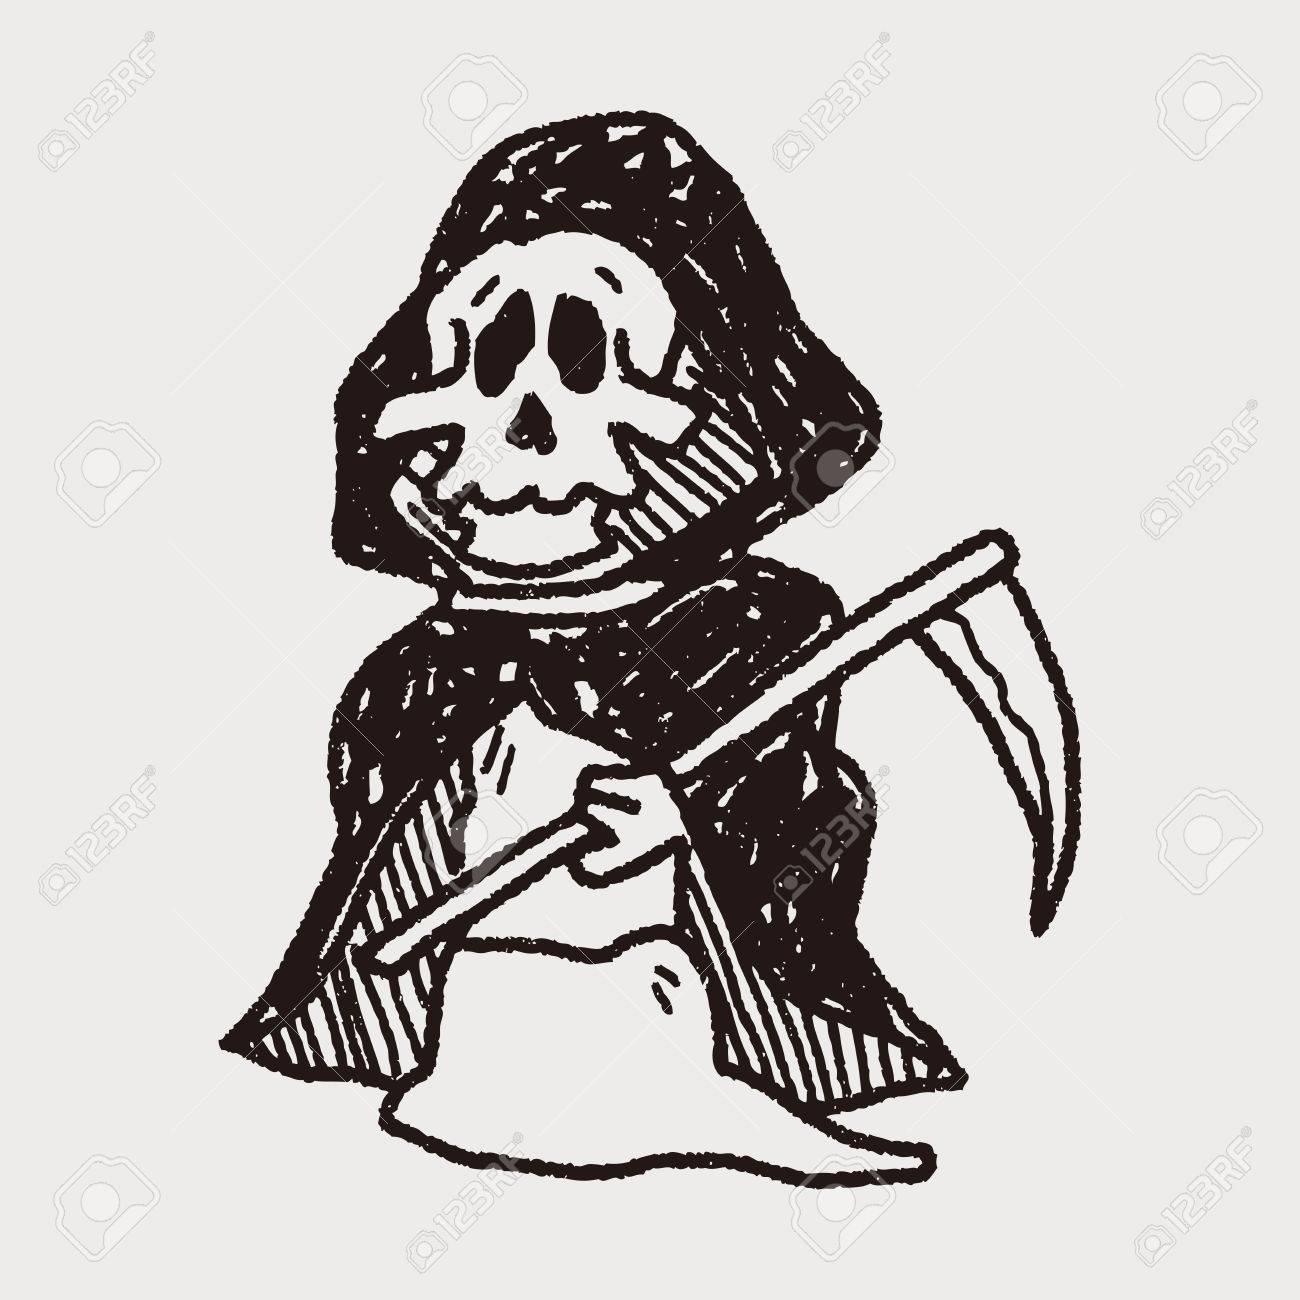 hight resolution of grim reaper doodle stock vector 40713247